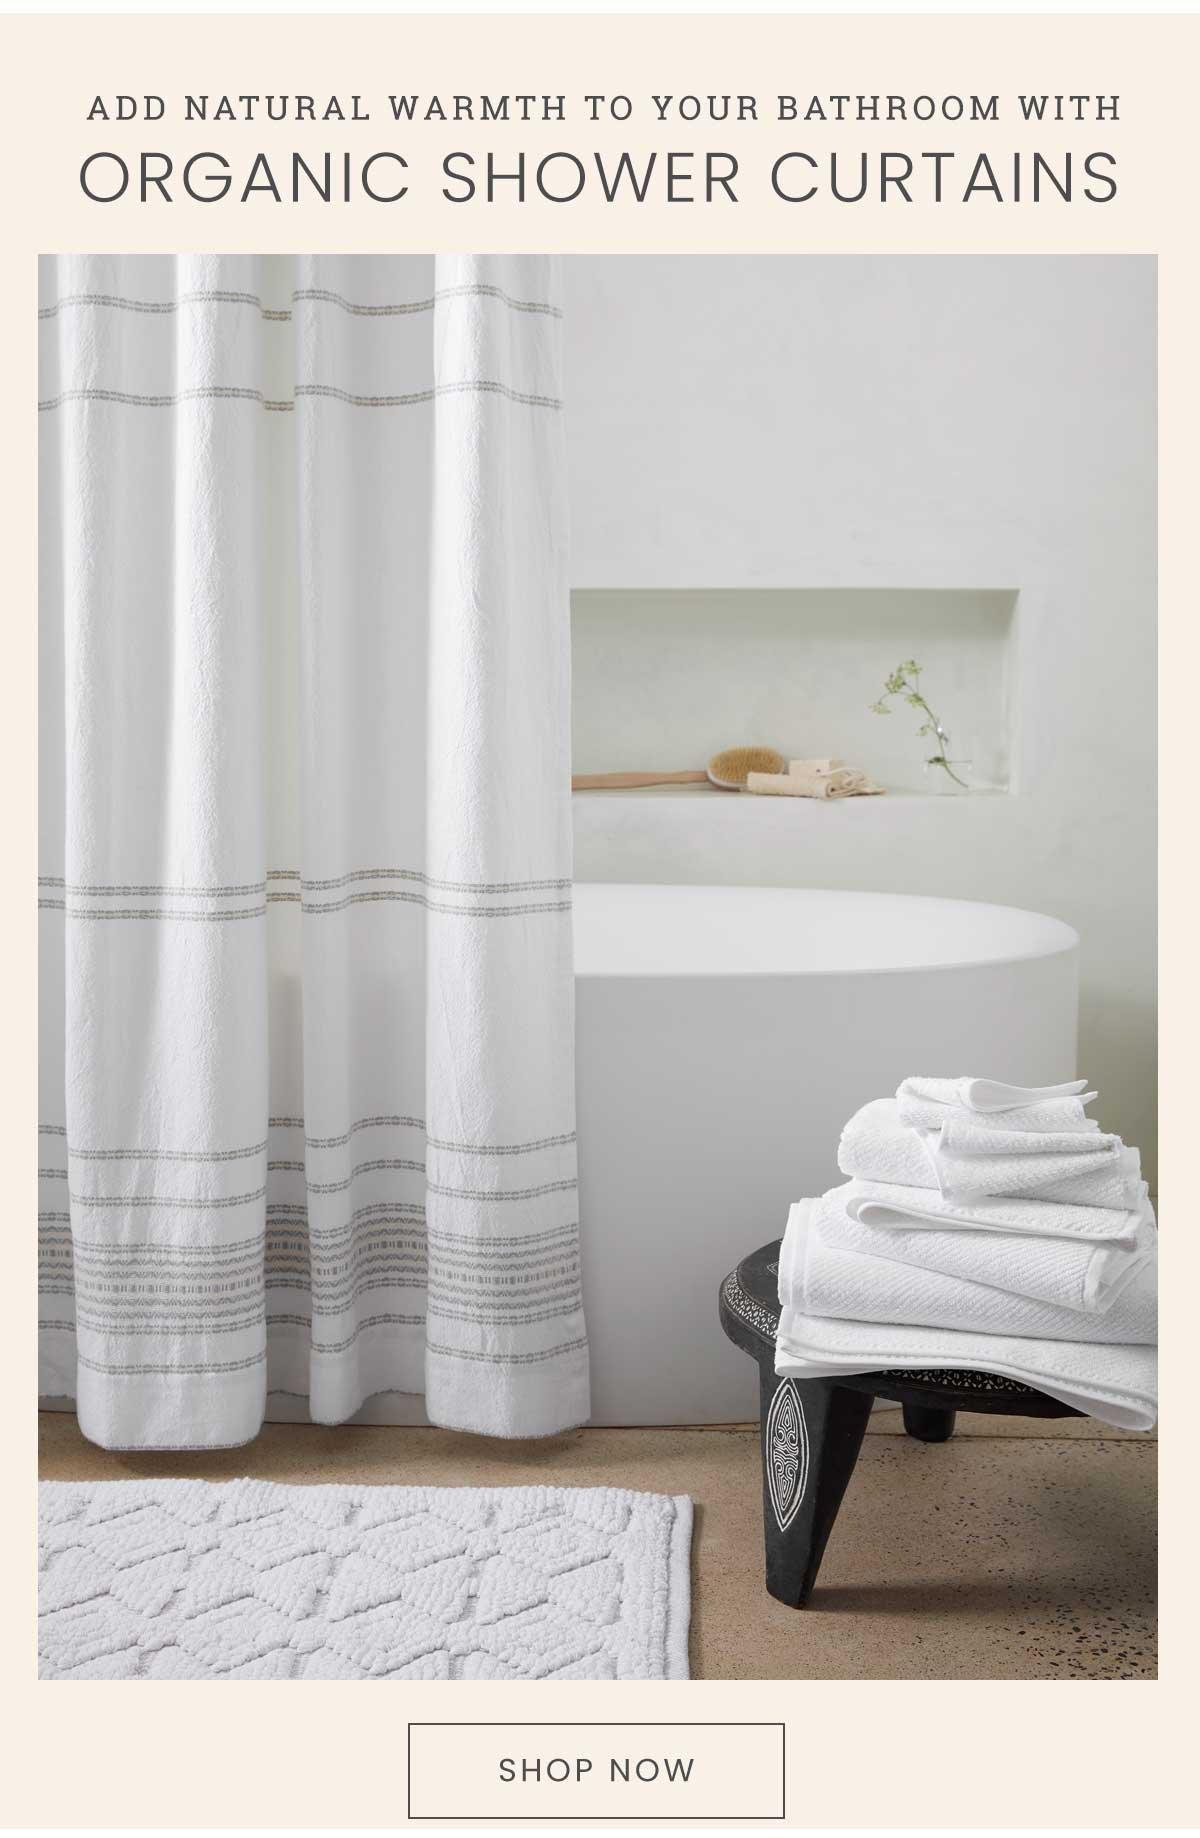 Coyuchi Mix Match Your Towels With Organic Bath Mats